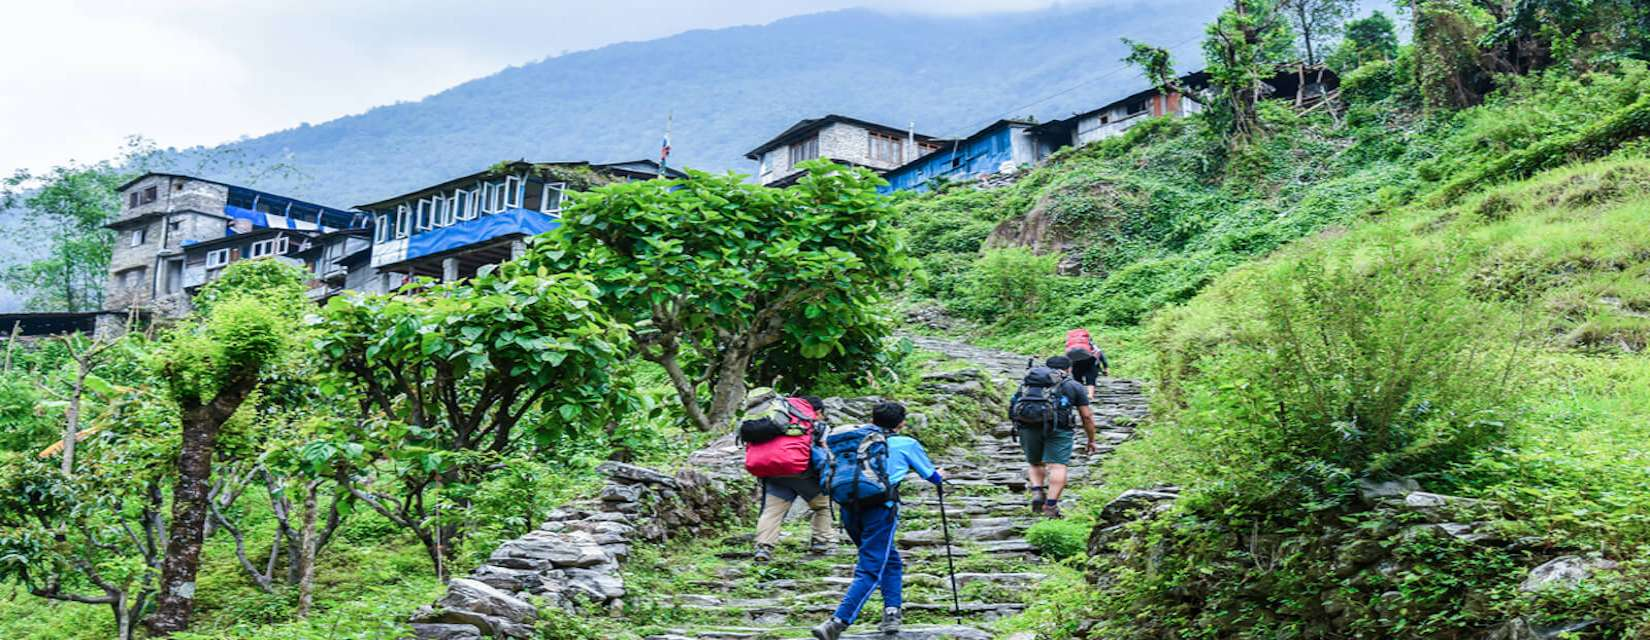 Family Trekking in Nepal